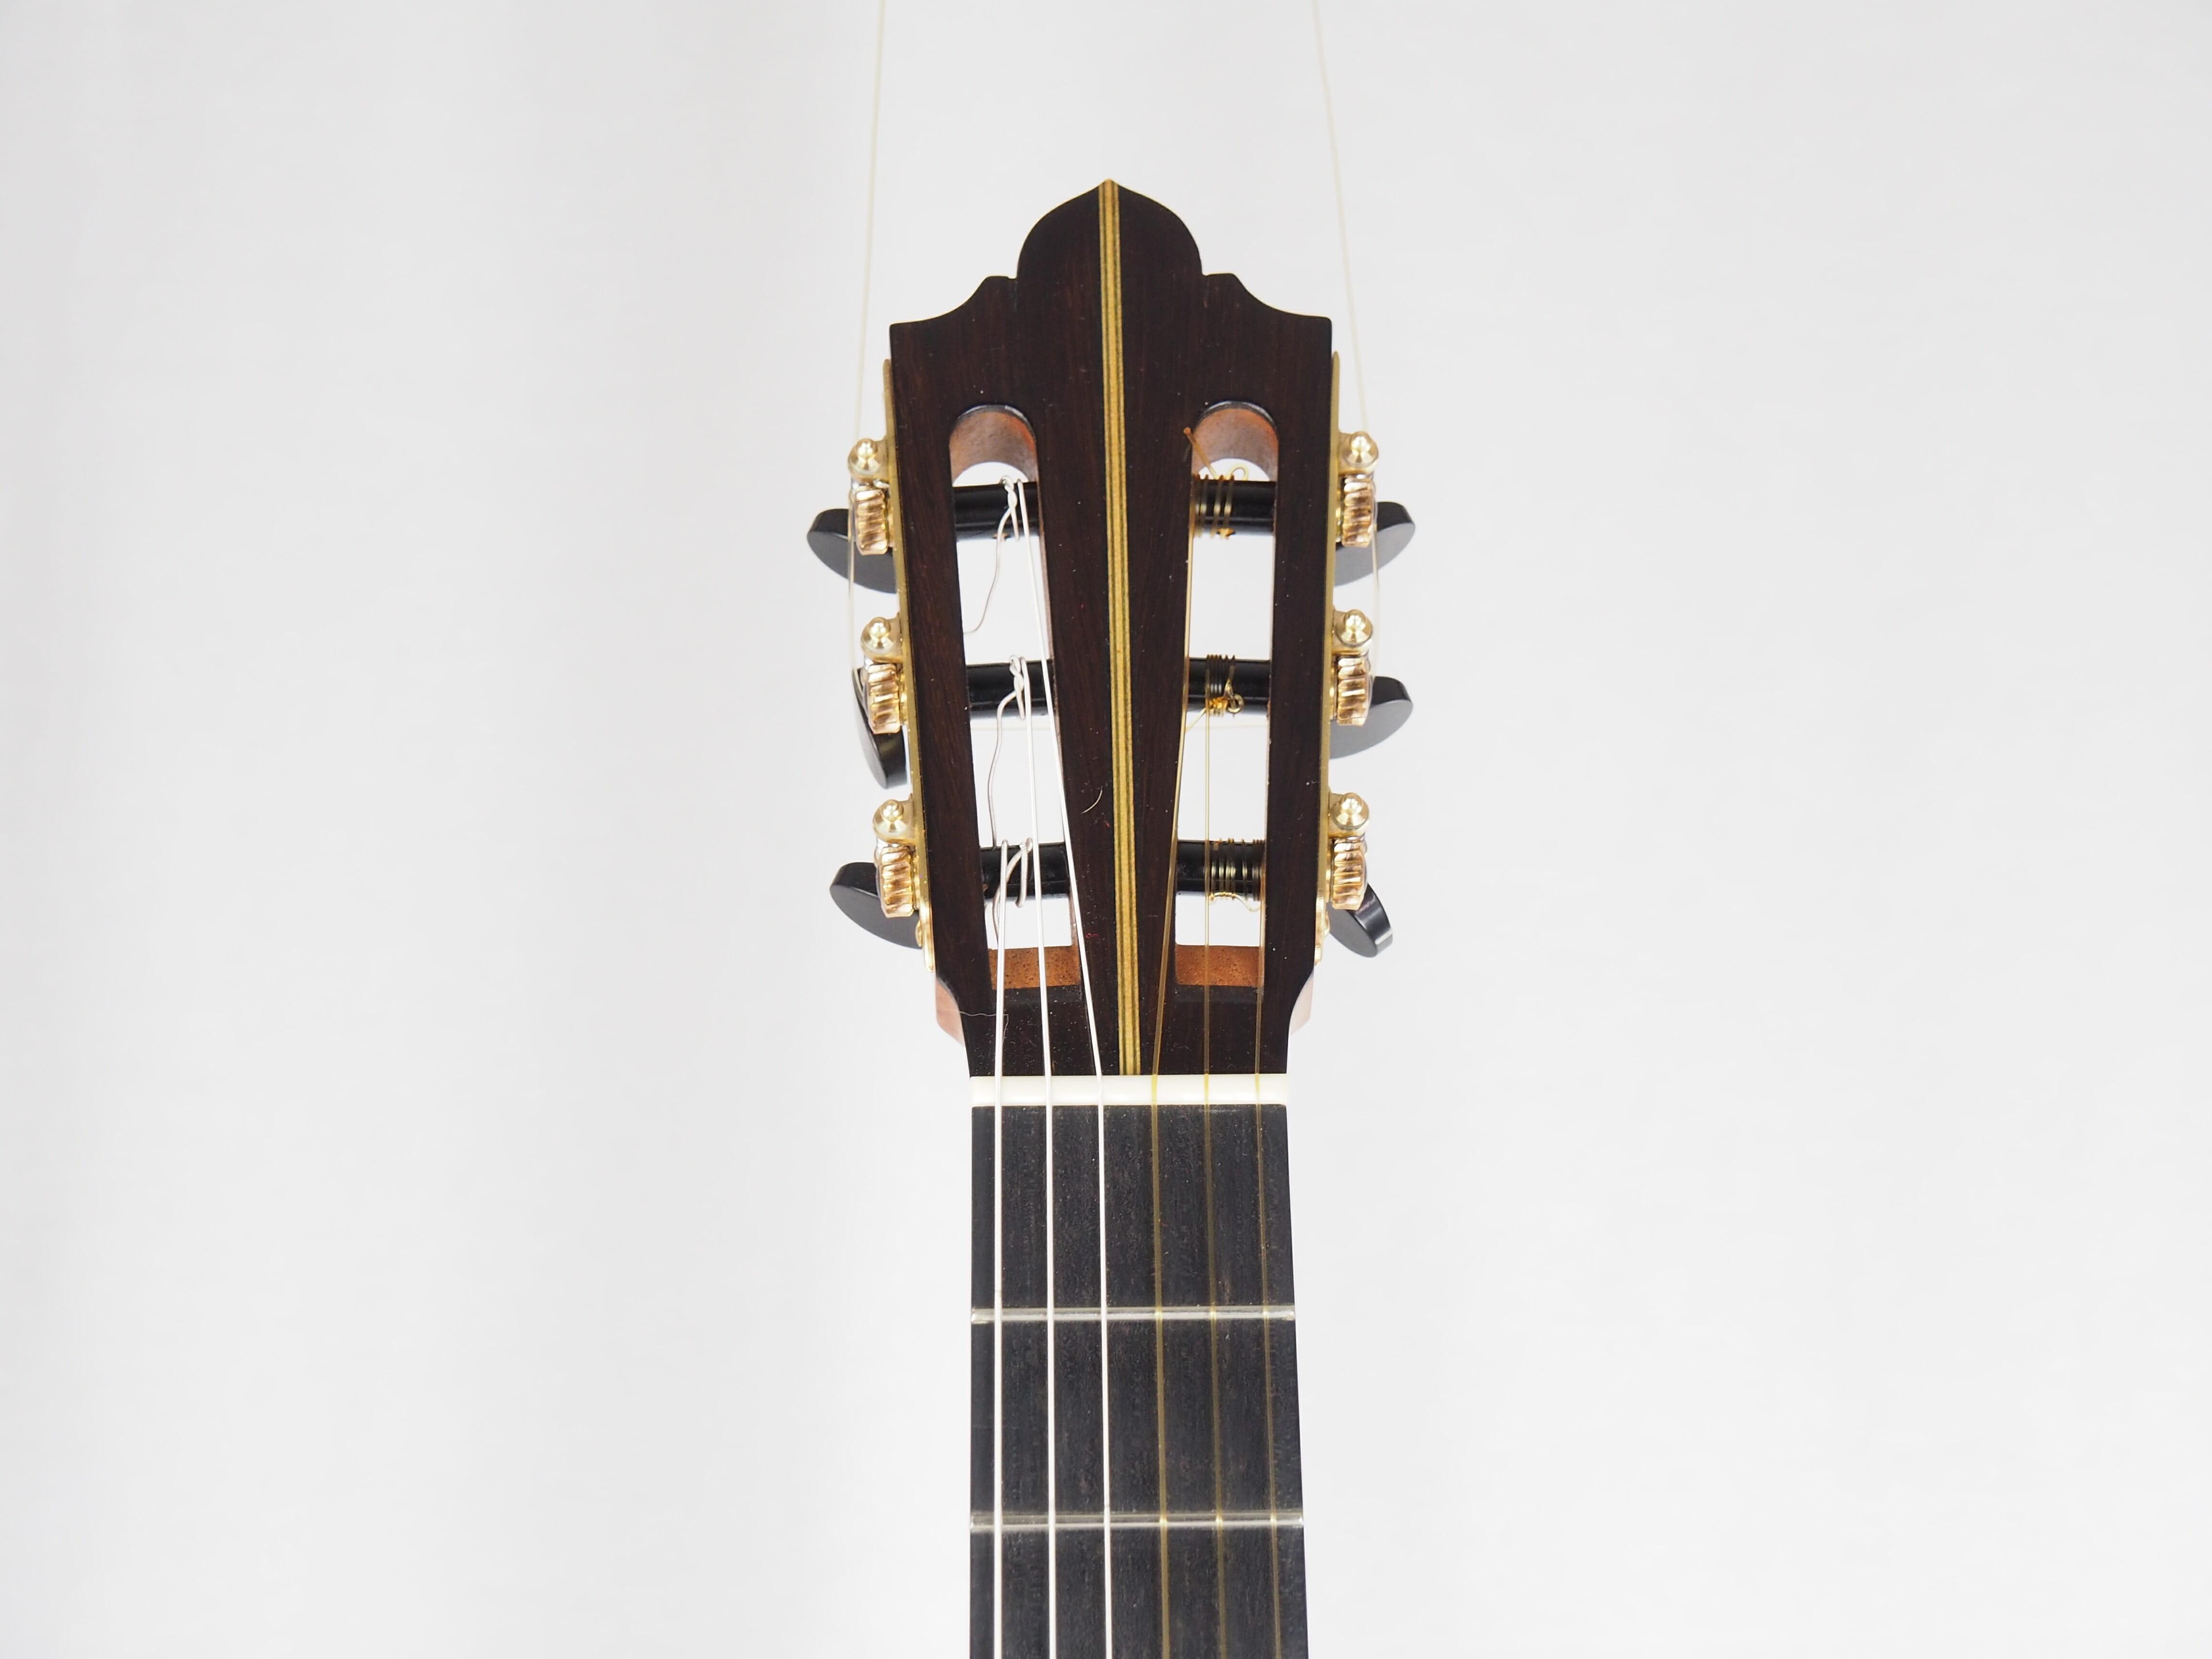 Luthier Keijo Korelin guitare classique double-table 17KOR093-03